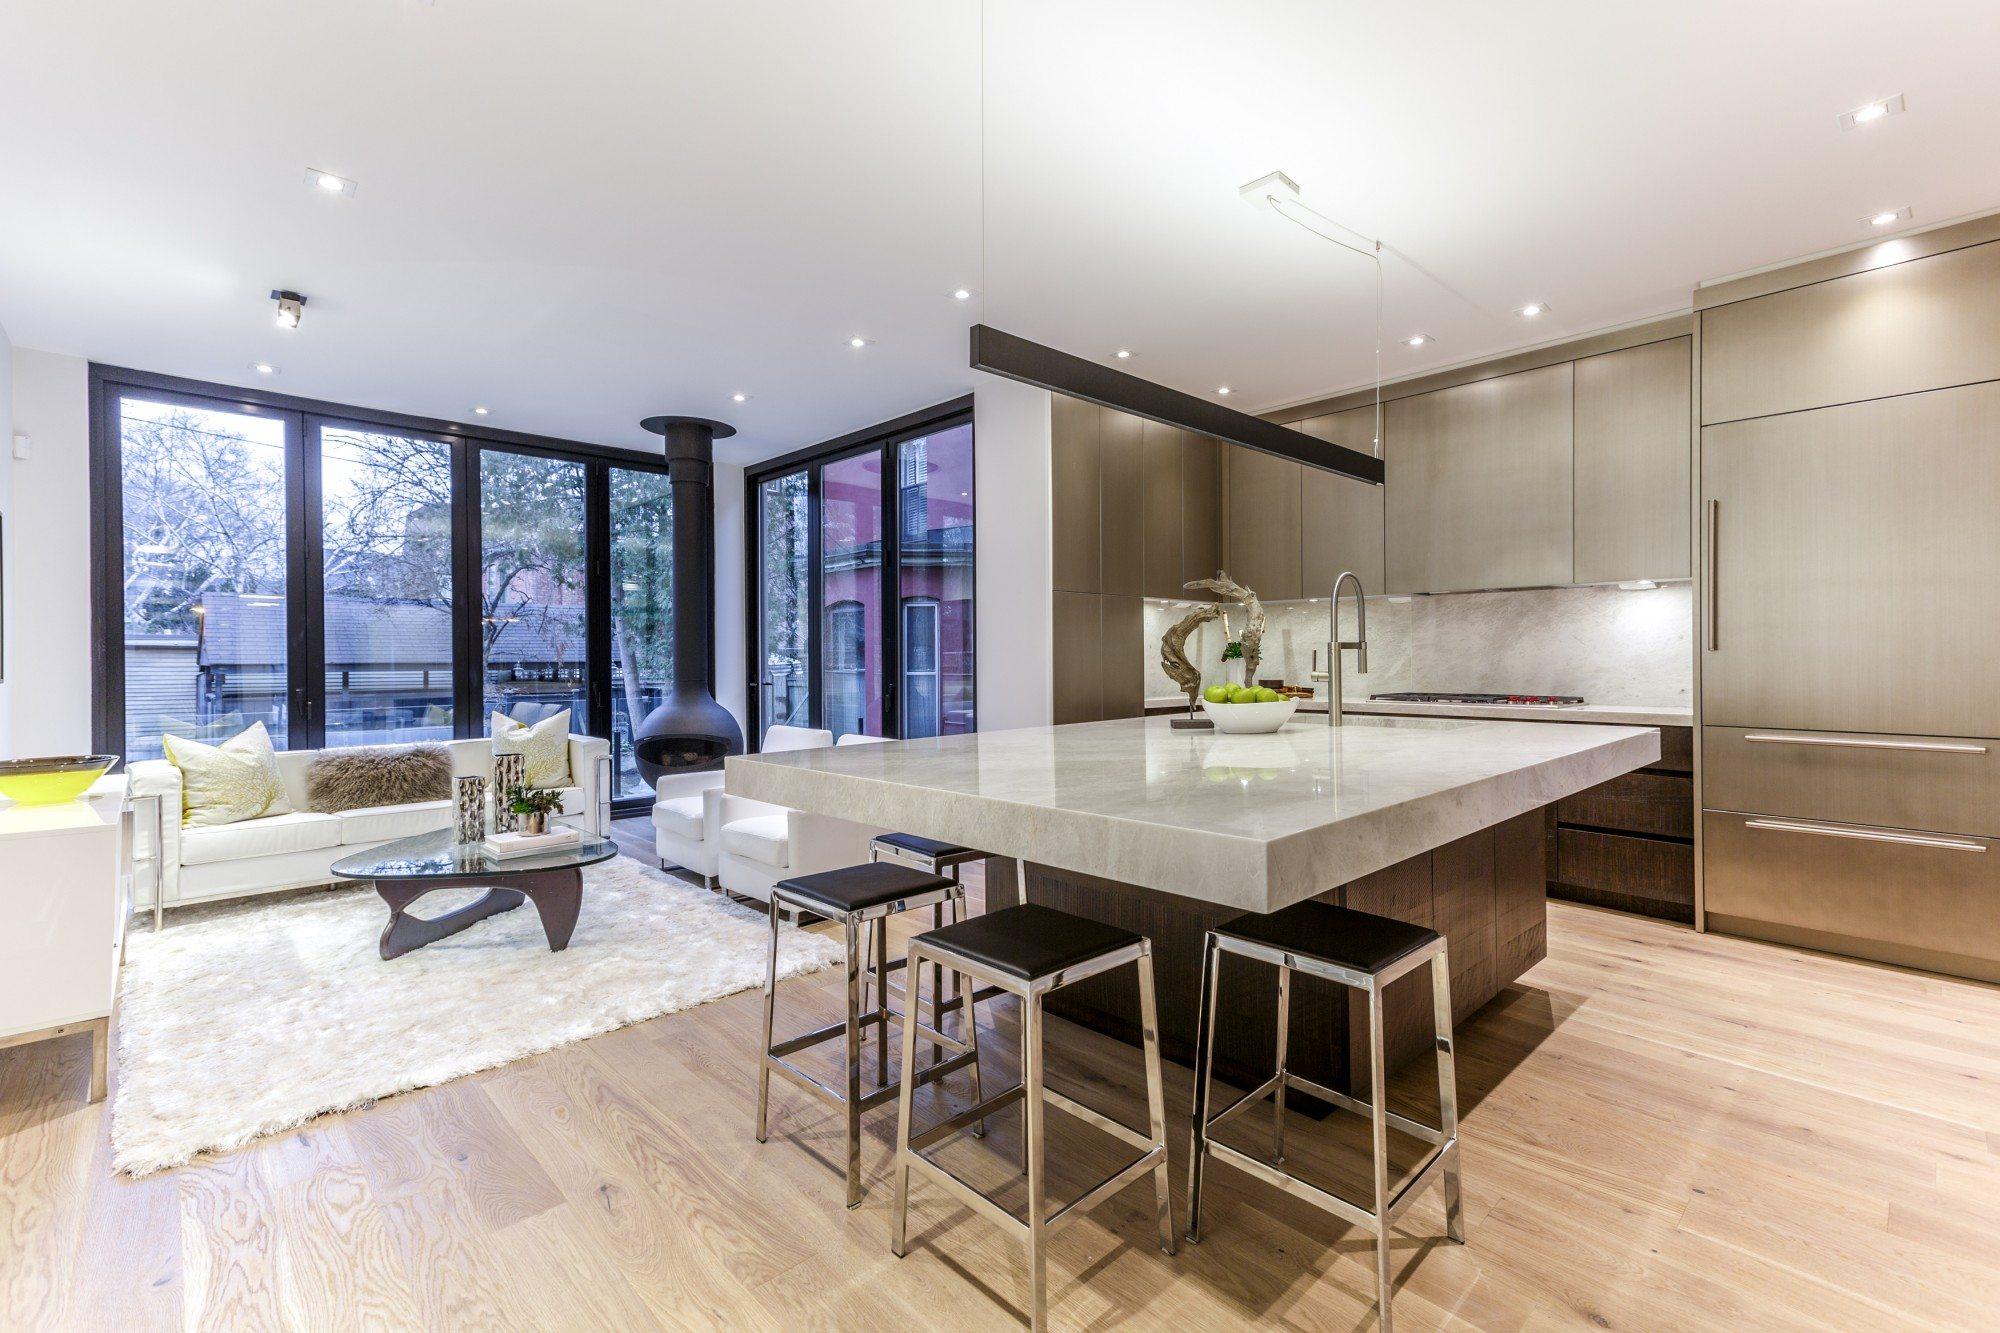 toronto-house-for-sale-73-metcalfe-street-6